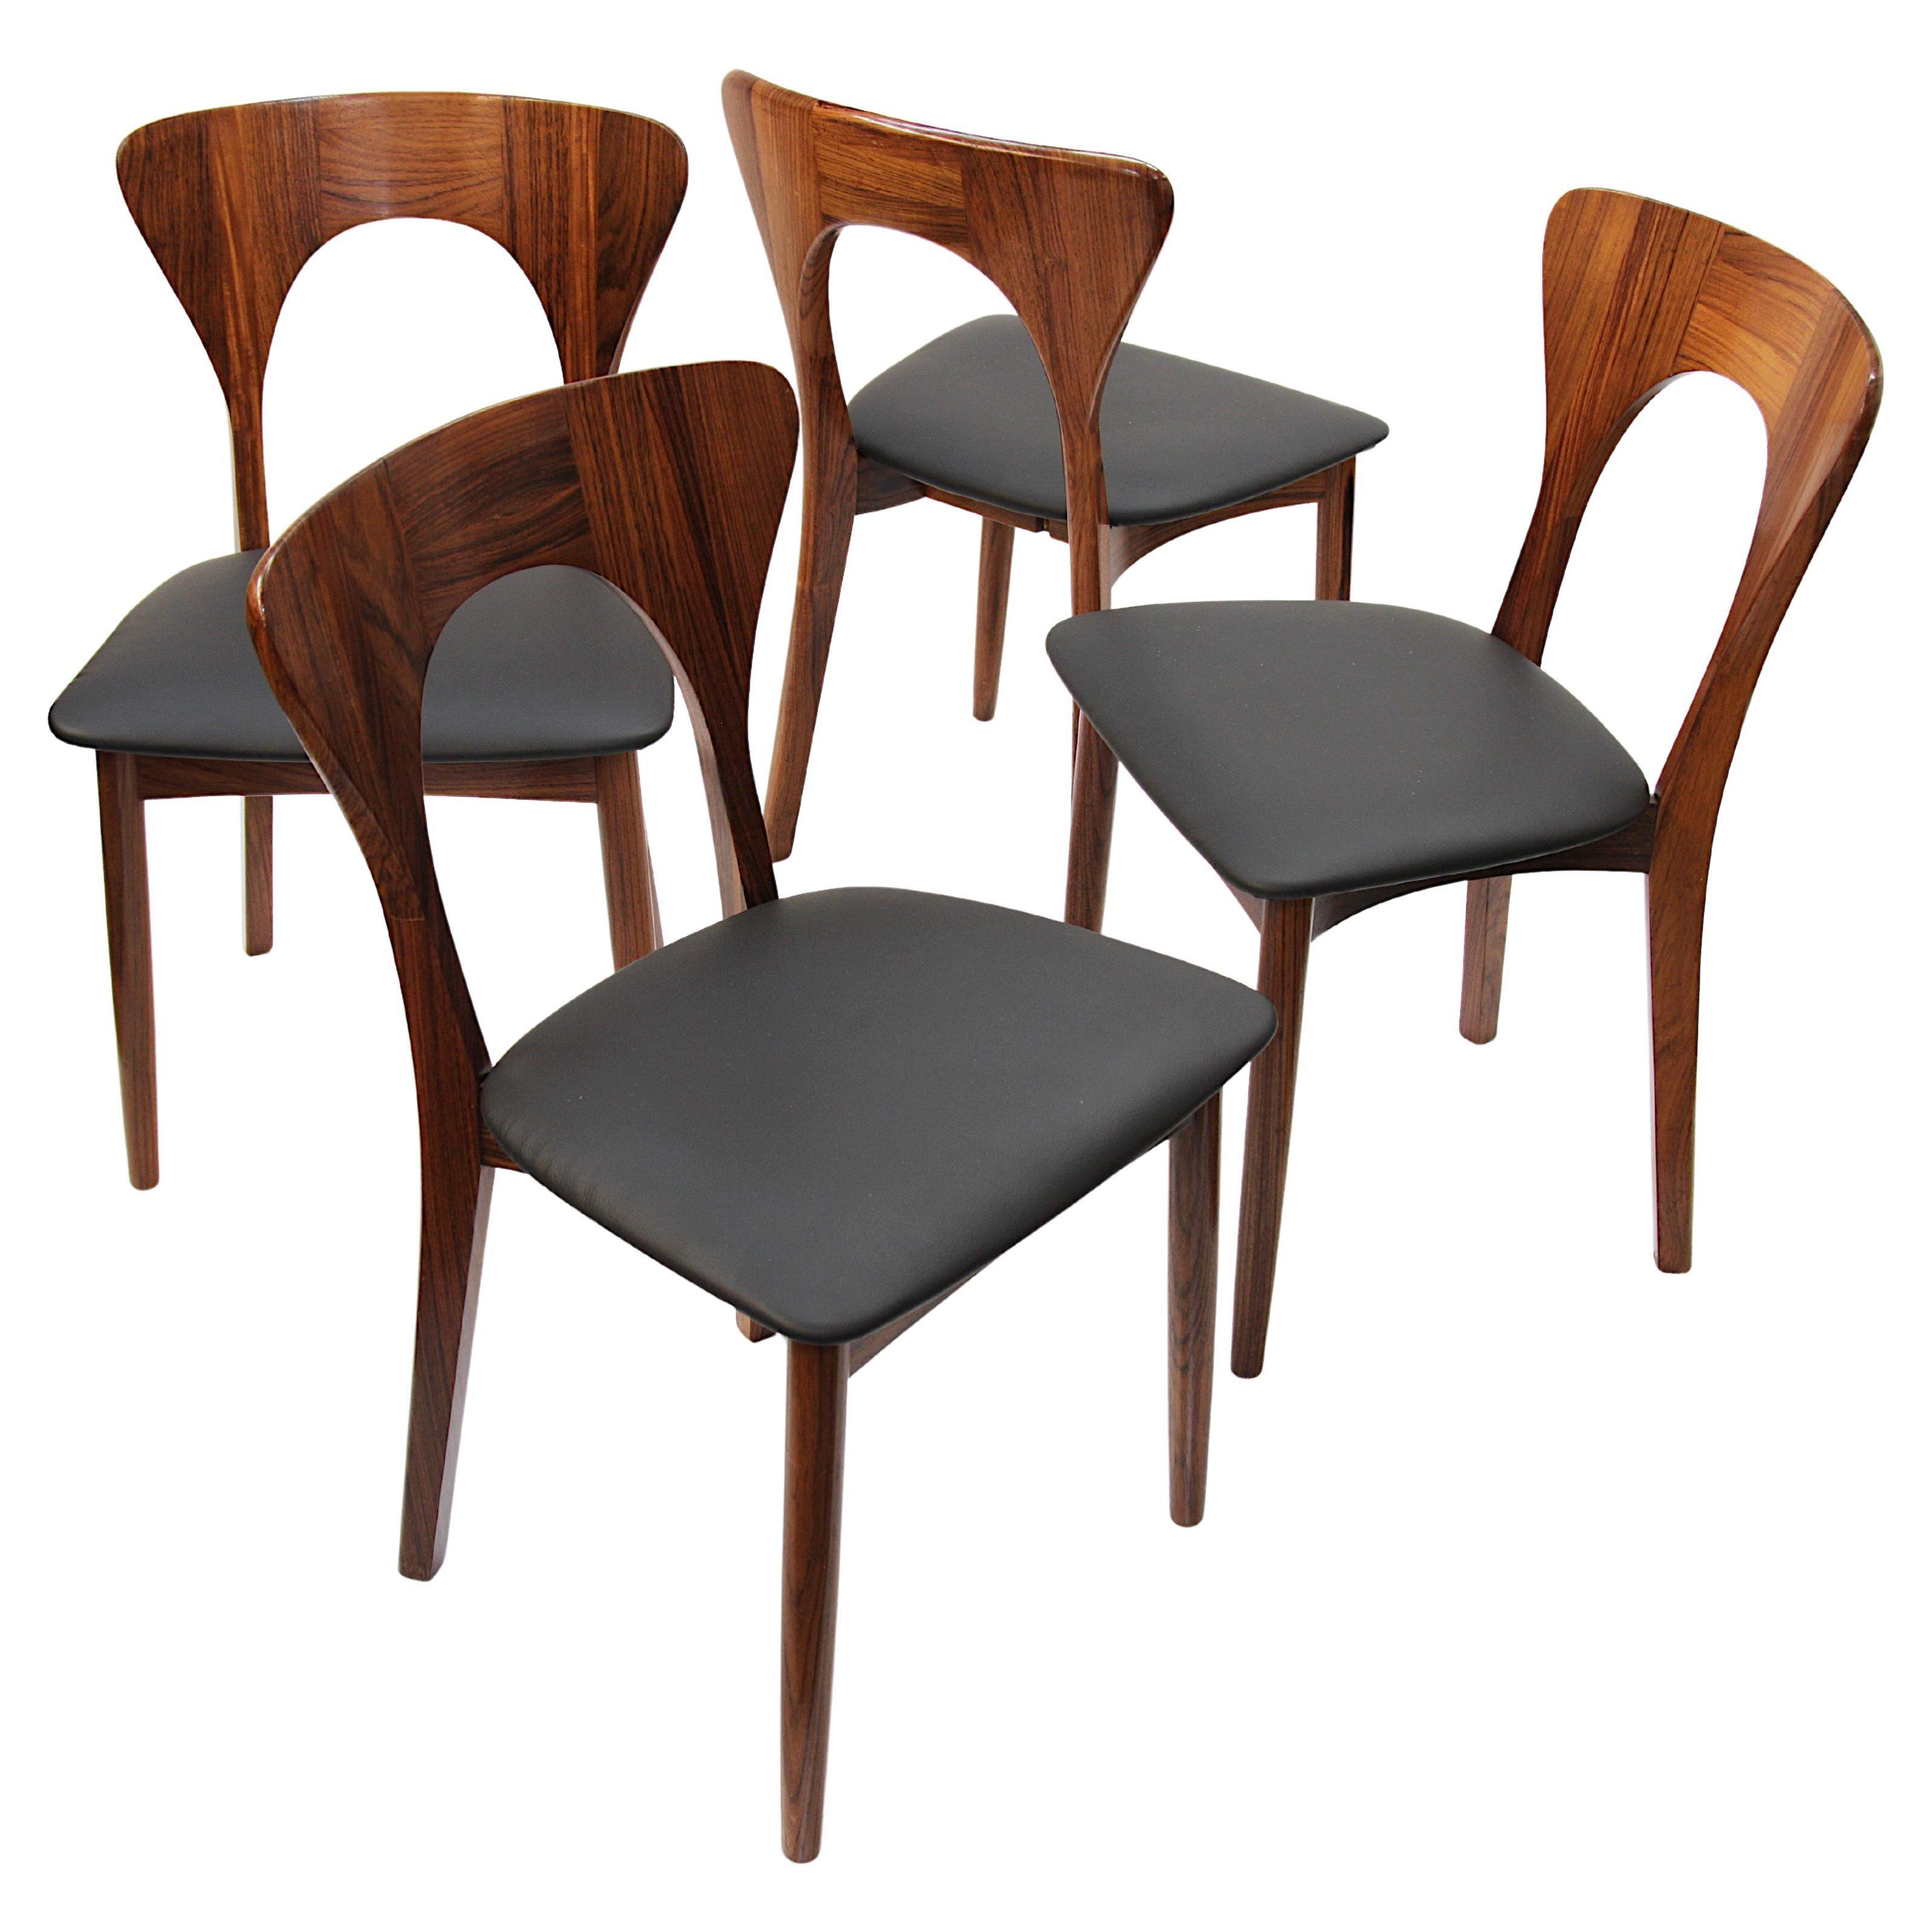 Set of 4 Danish Mid-Century Modern Rosewood Peter Chairs by Niels Koefoed